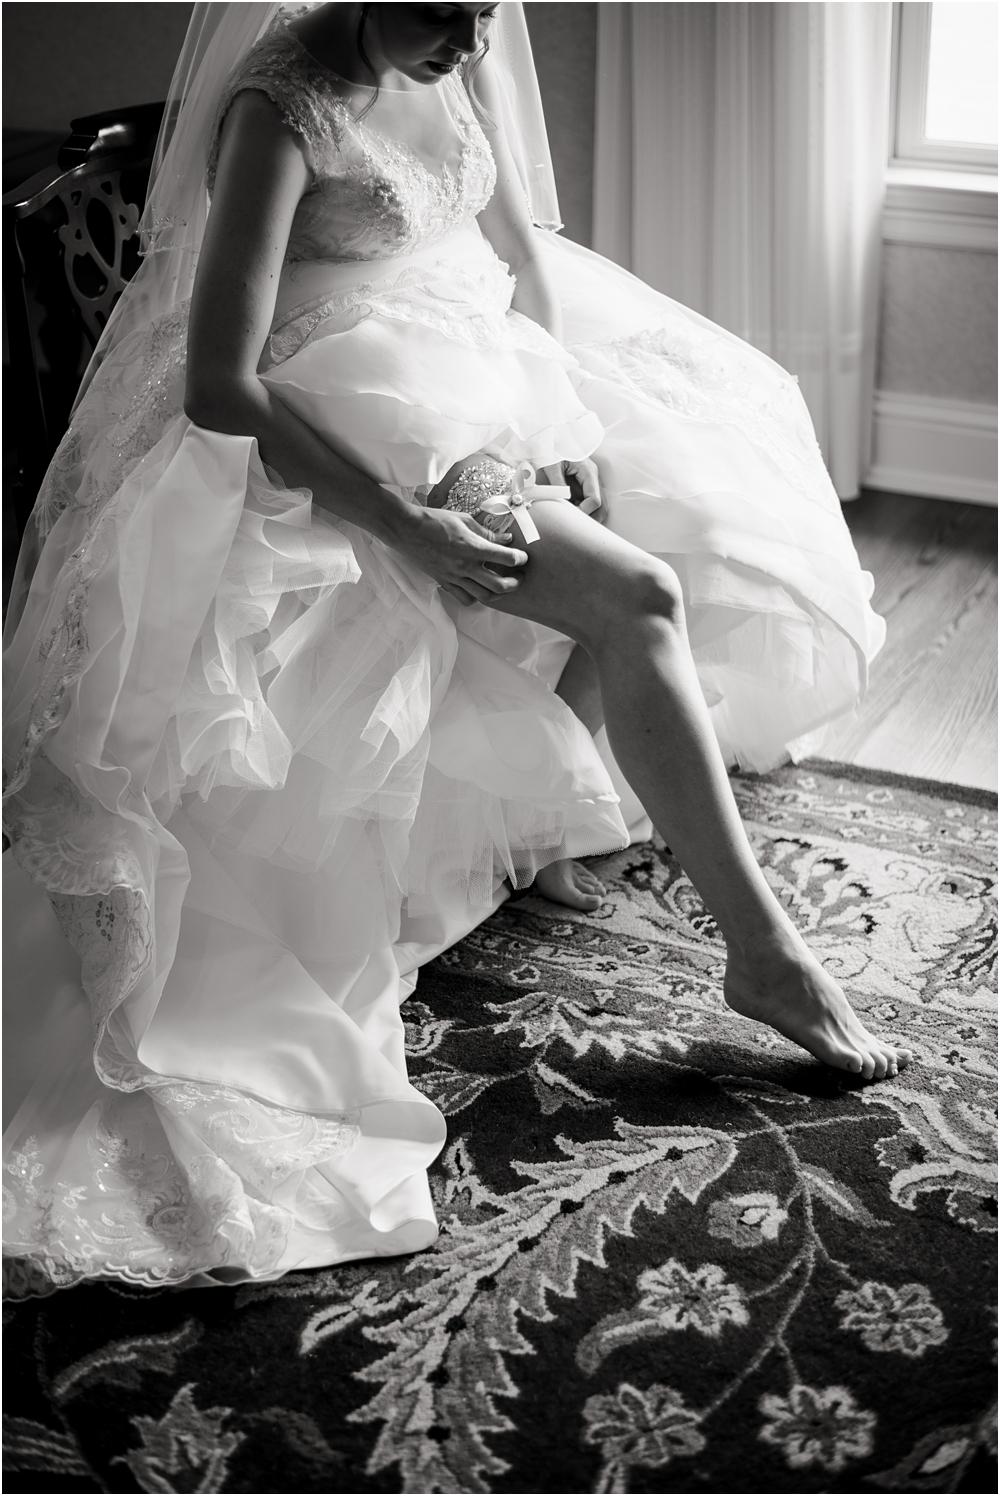 marianna-florida-wedding-photographer-kiersten-grant-28.jpg